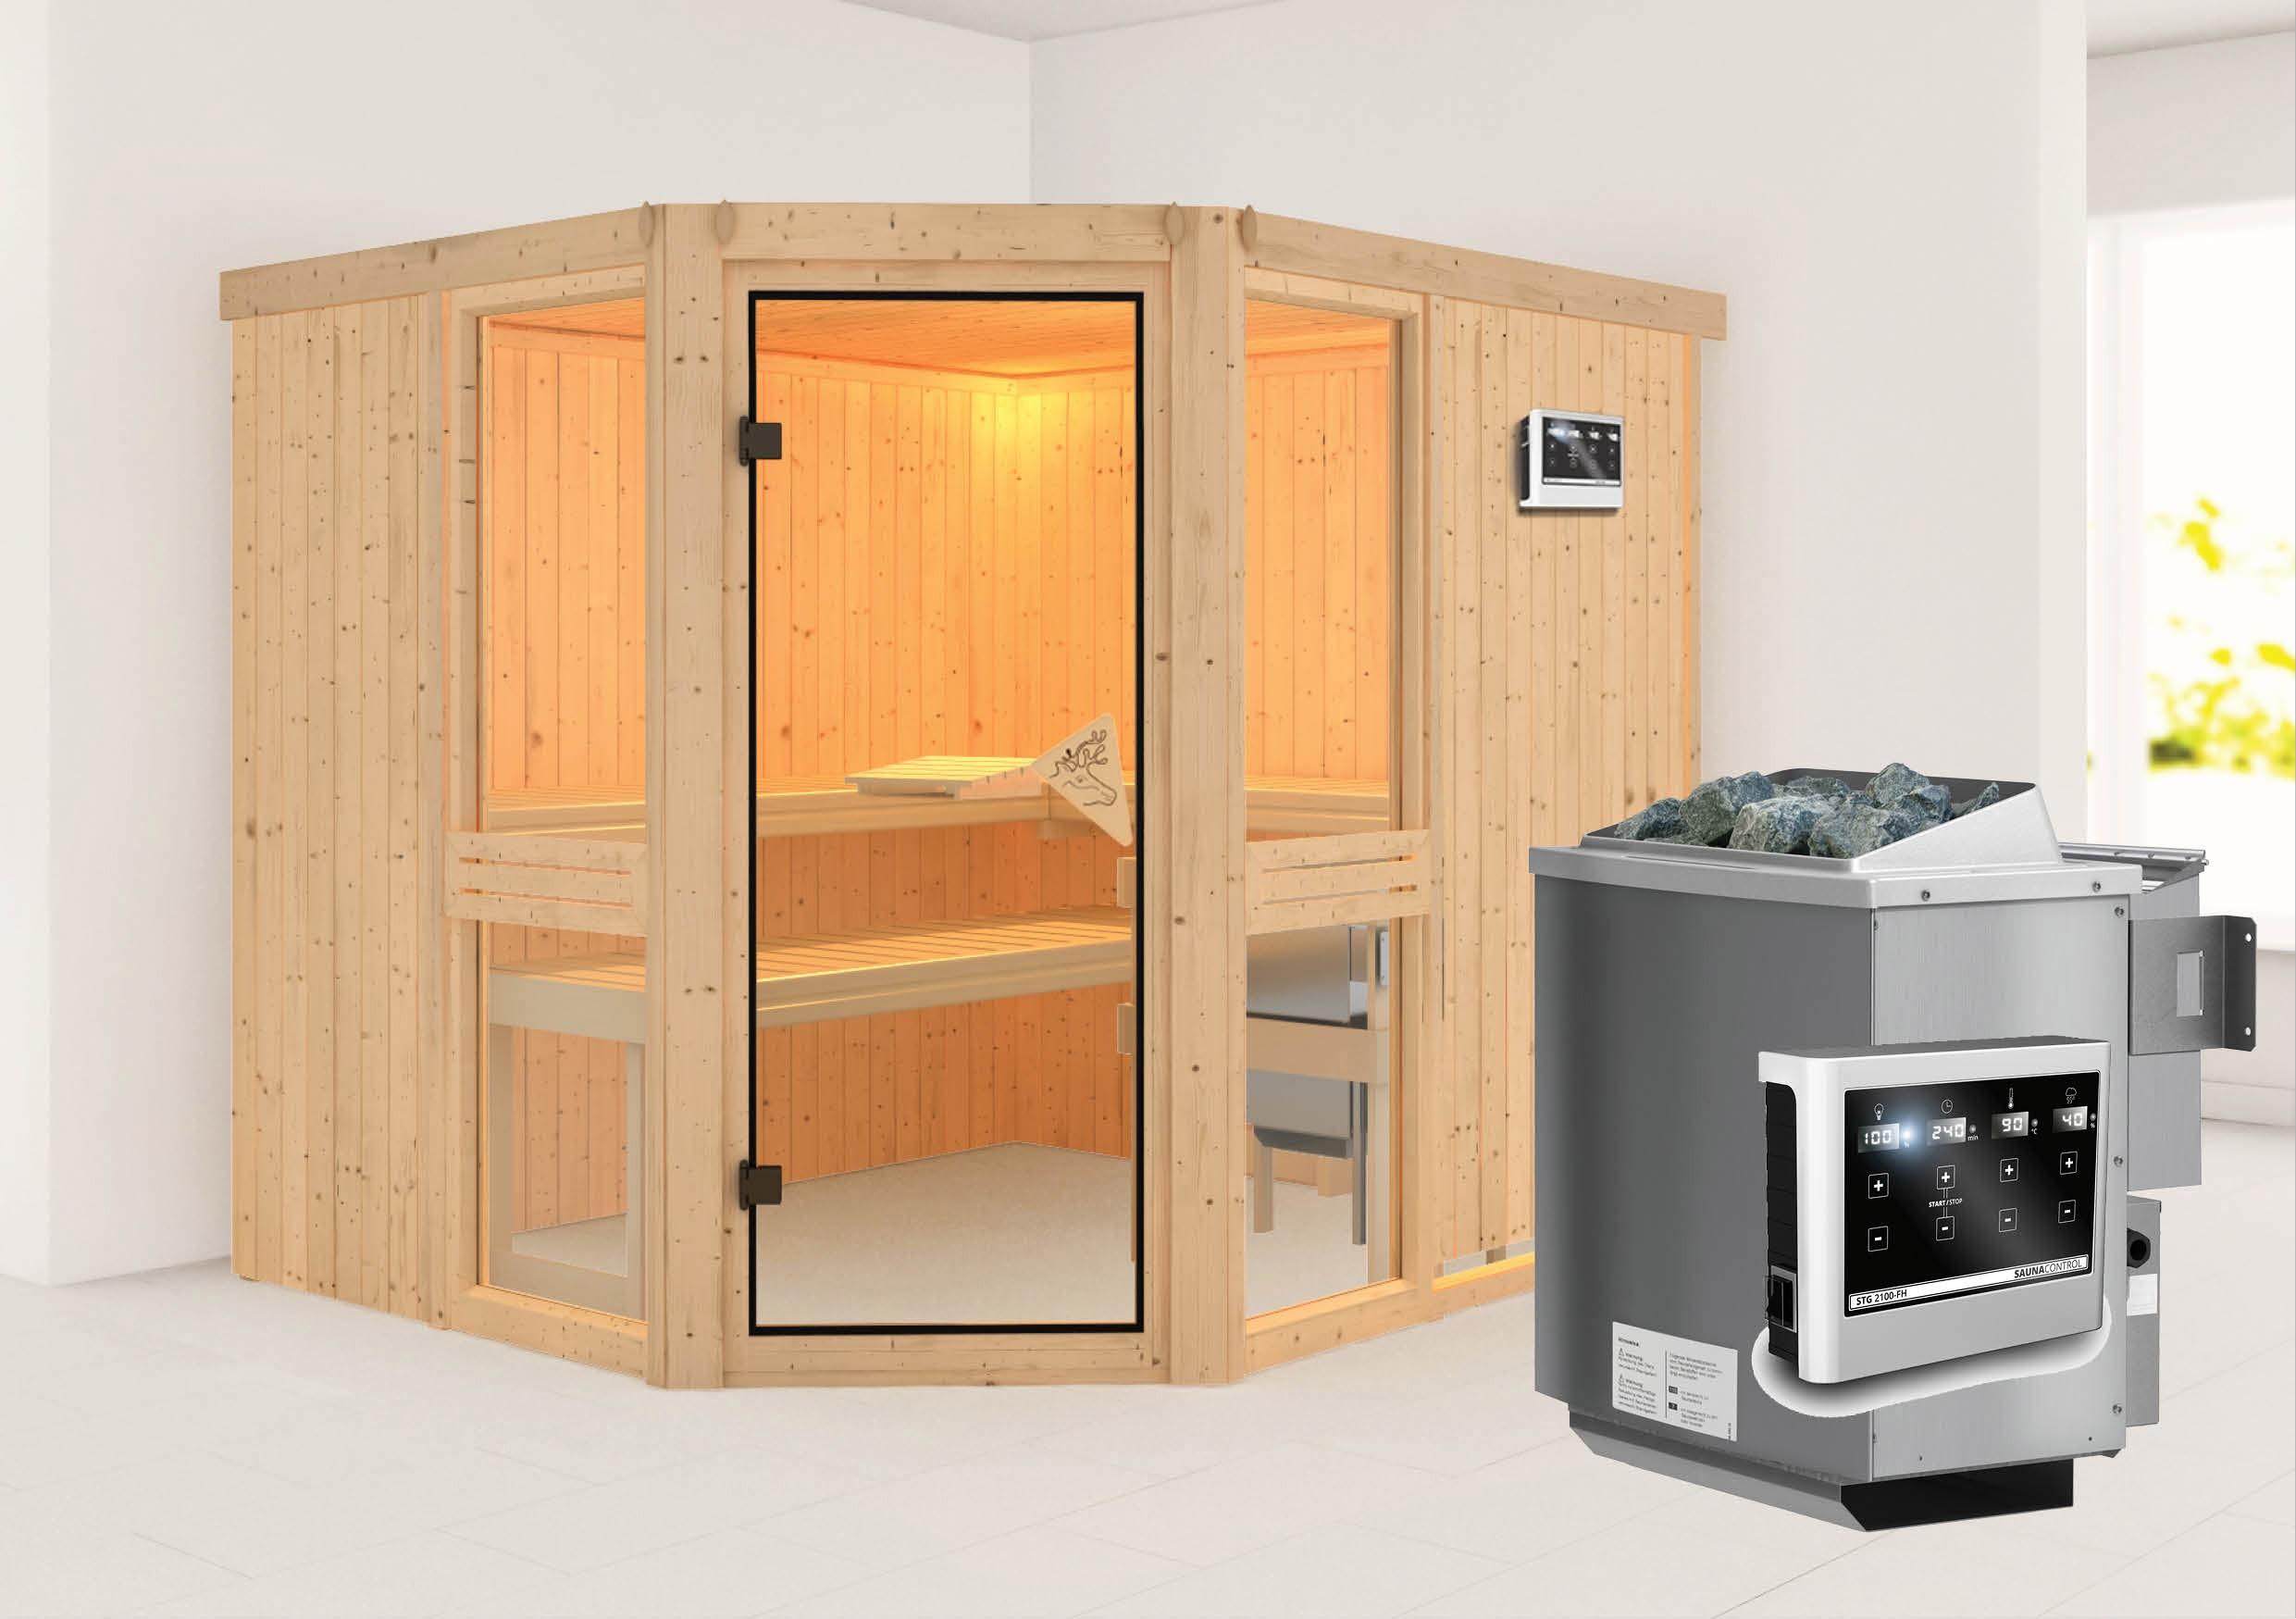 Karibu Sauna Amelia 3 68mm mit Bio Ofen 9kW extern classic Tür Bild 1